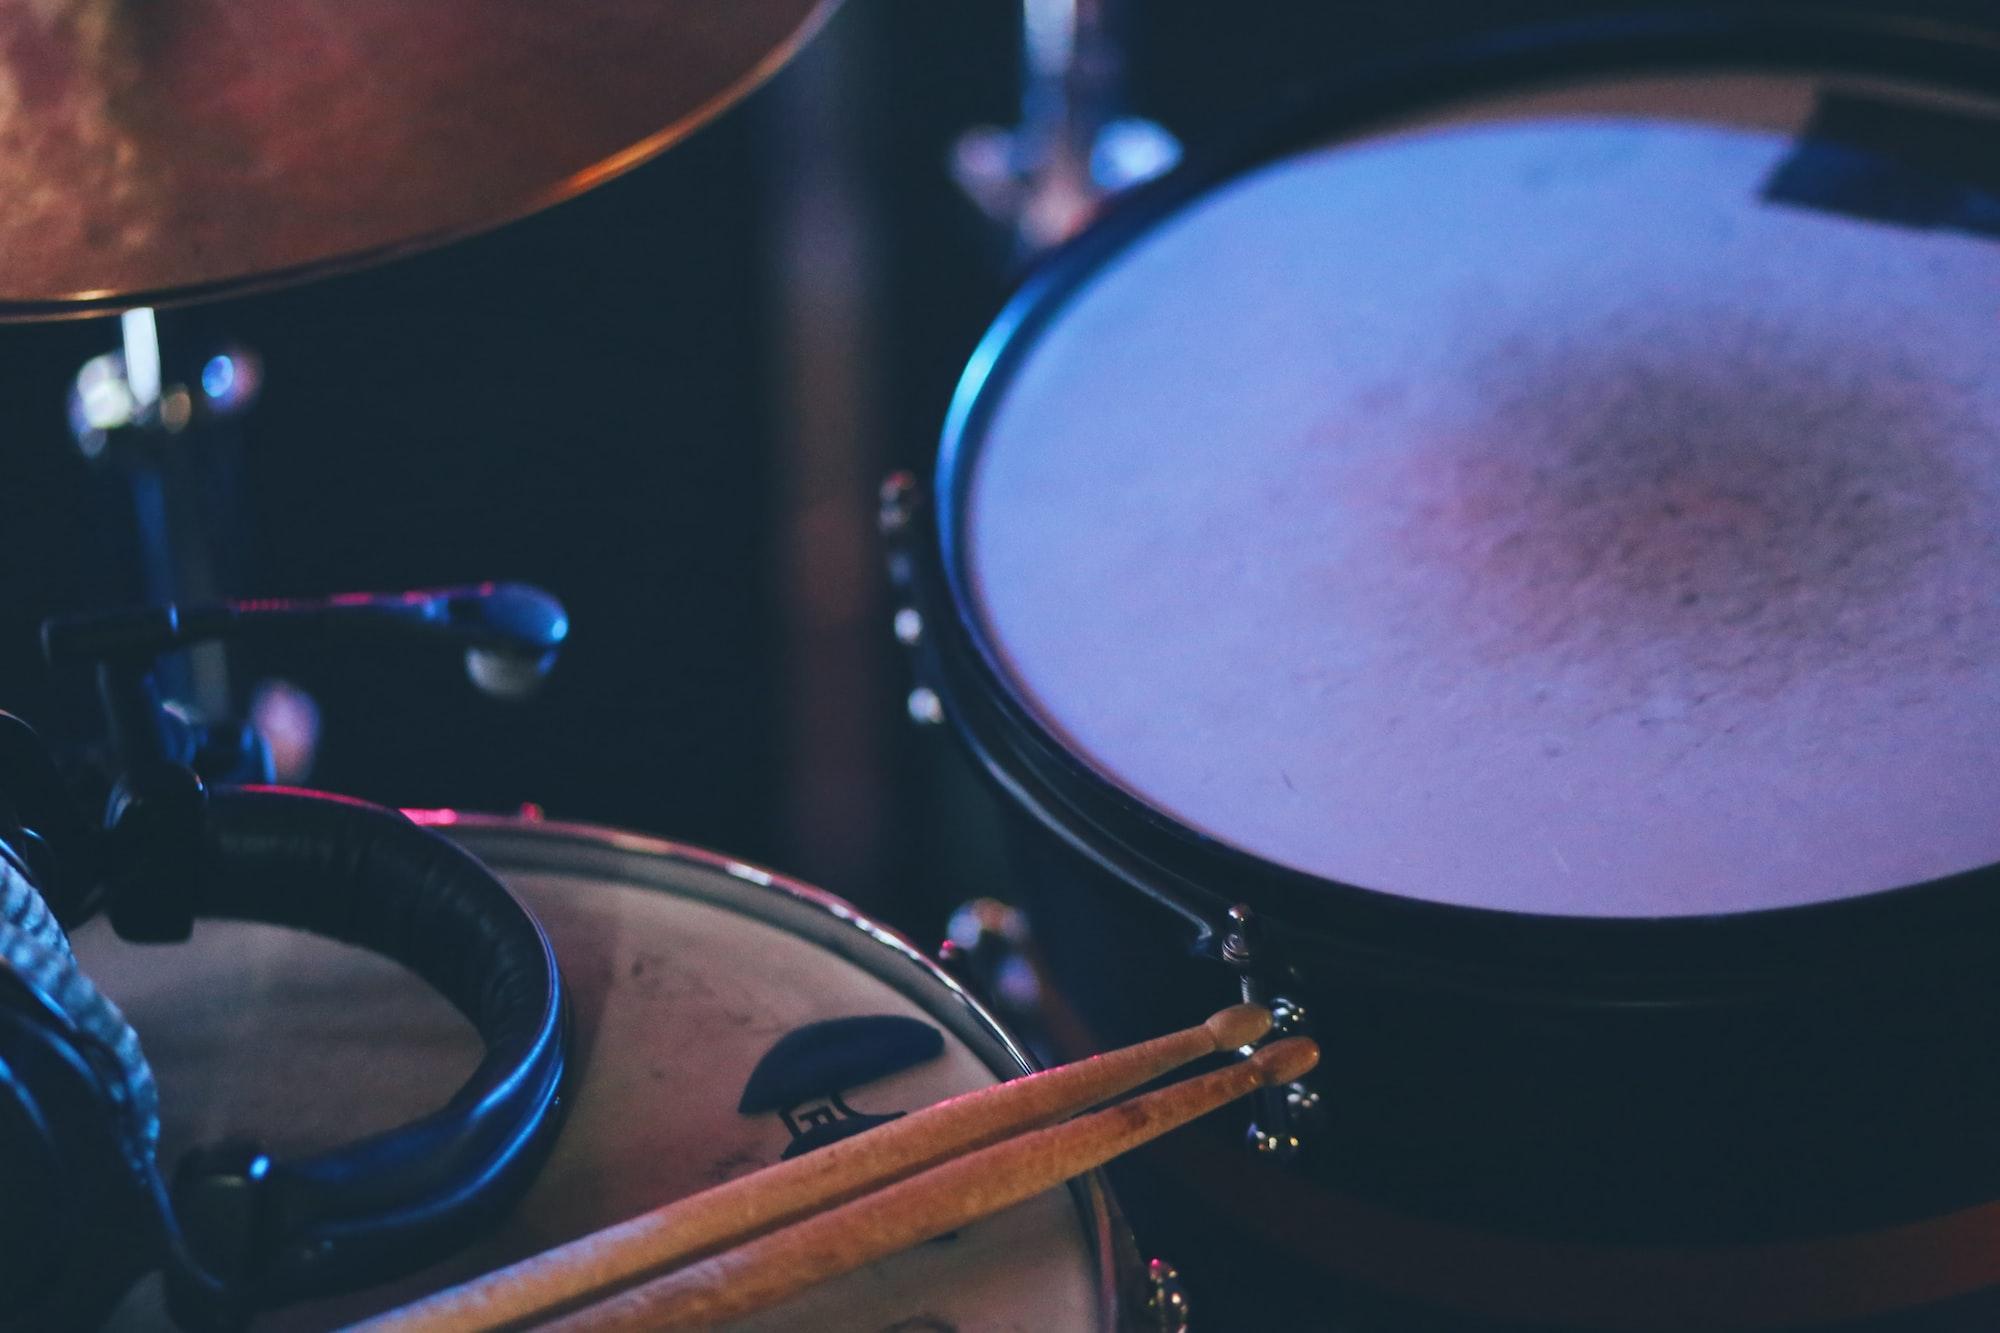 Studio Drum Kit - Sticks, Snare and Tom